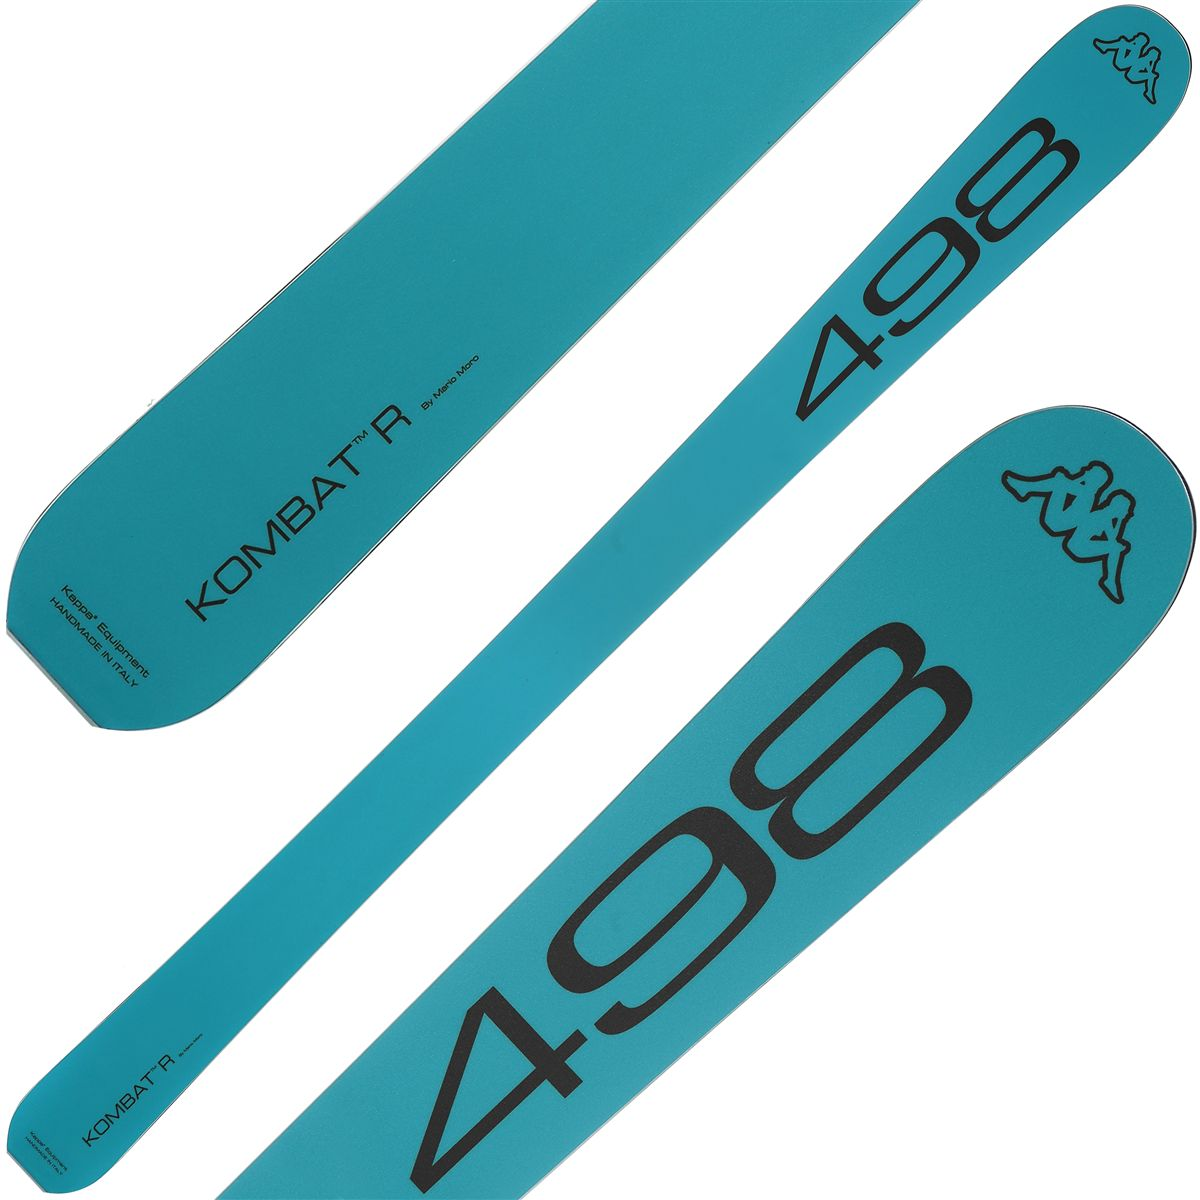 Kappa Ski Sci 4CENTO KOMBAT R 498 Uomo Donna Sci sport Rocker